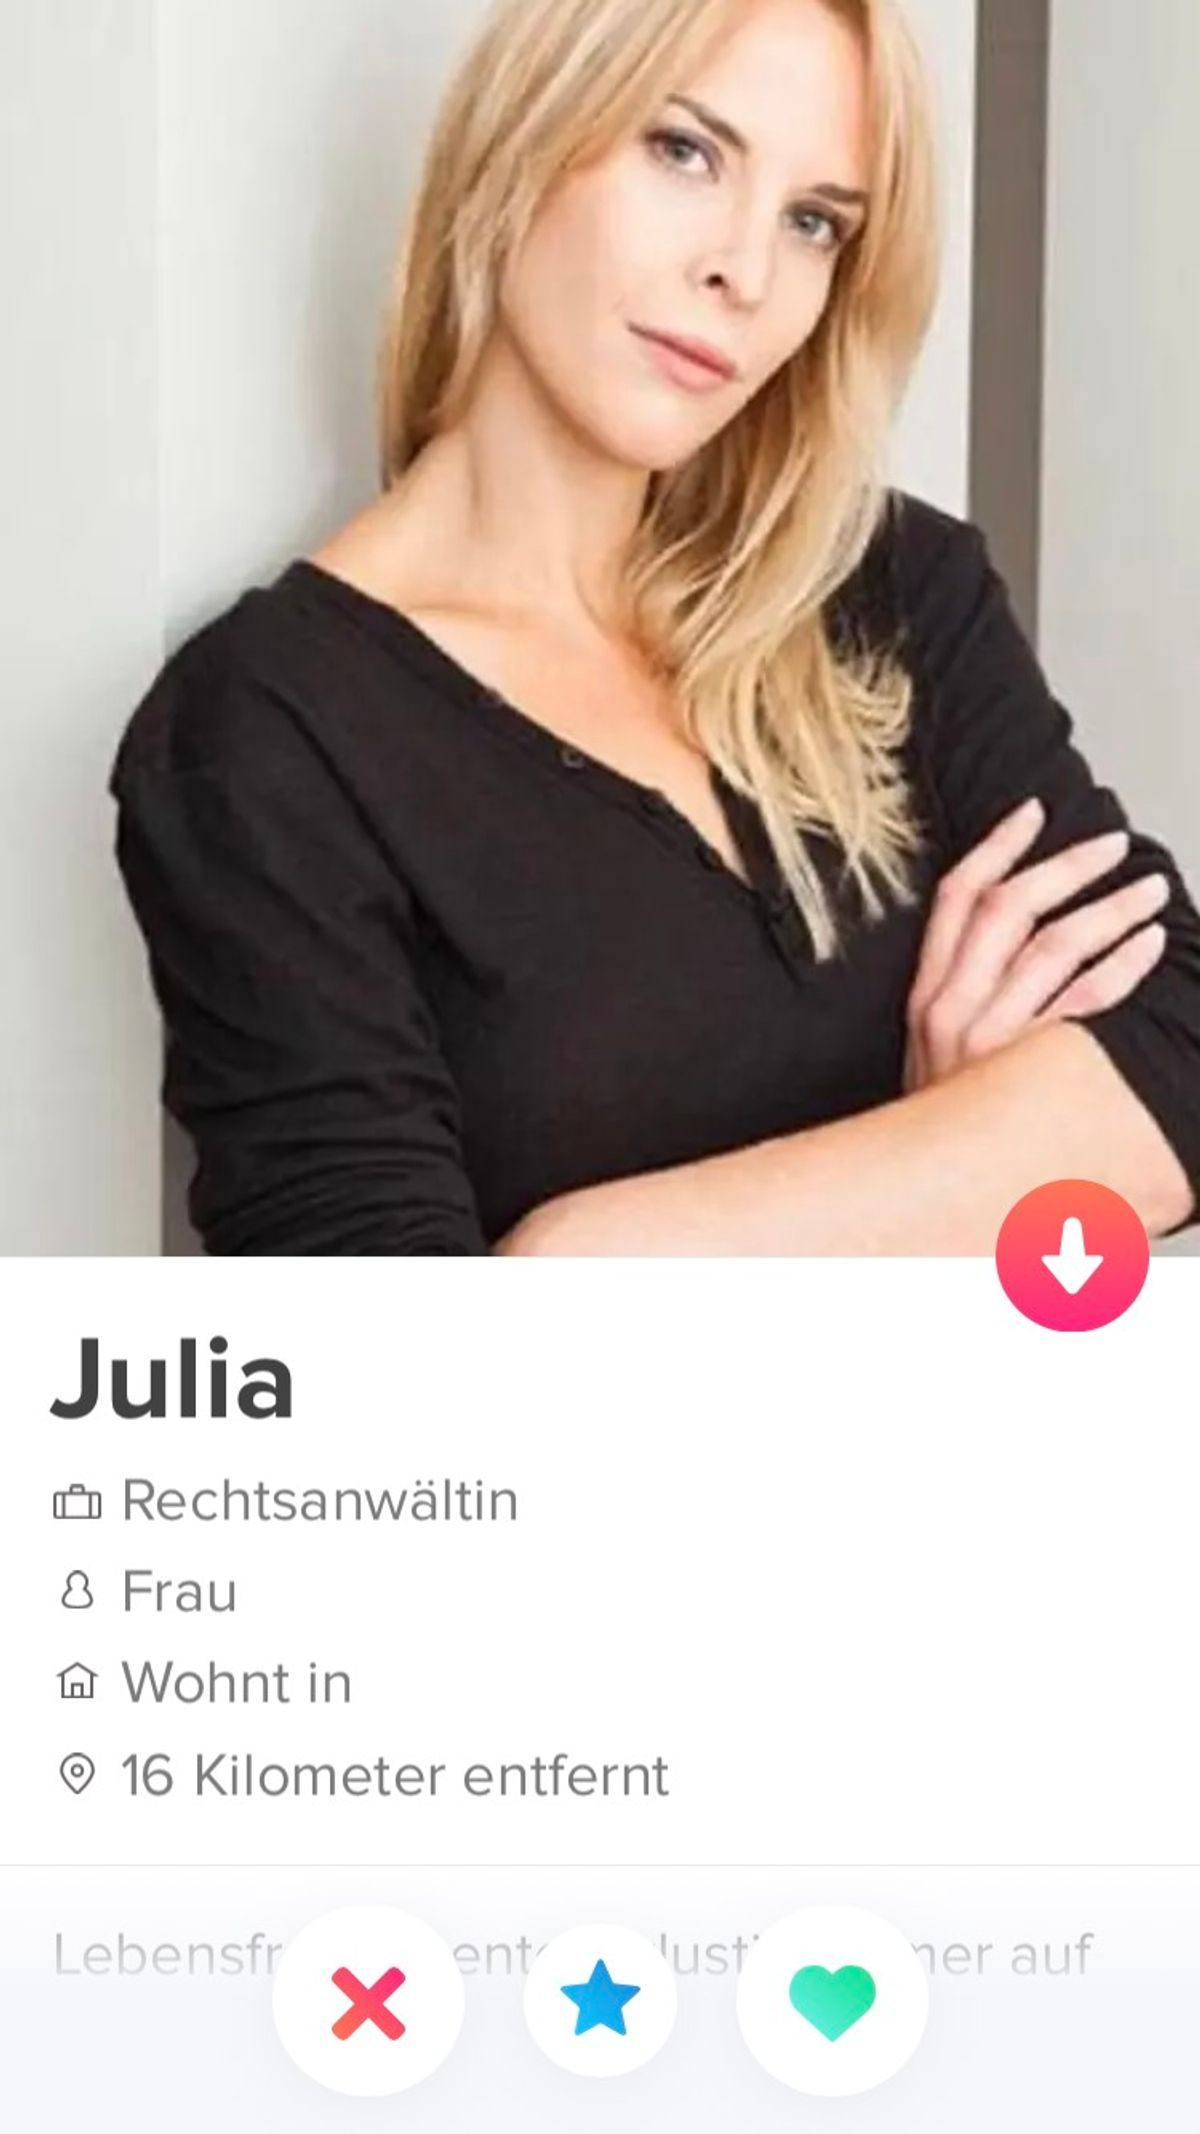 Die besten dating apps